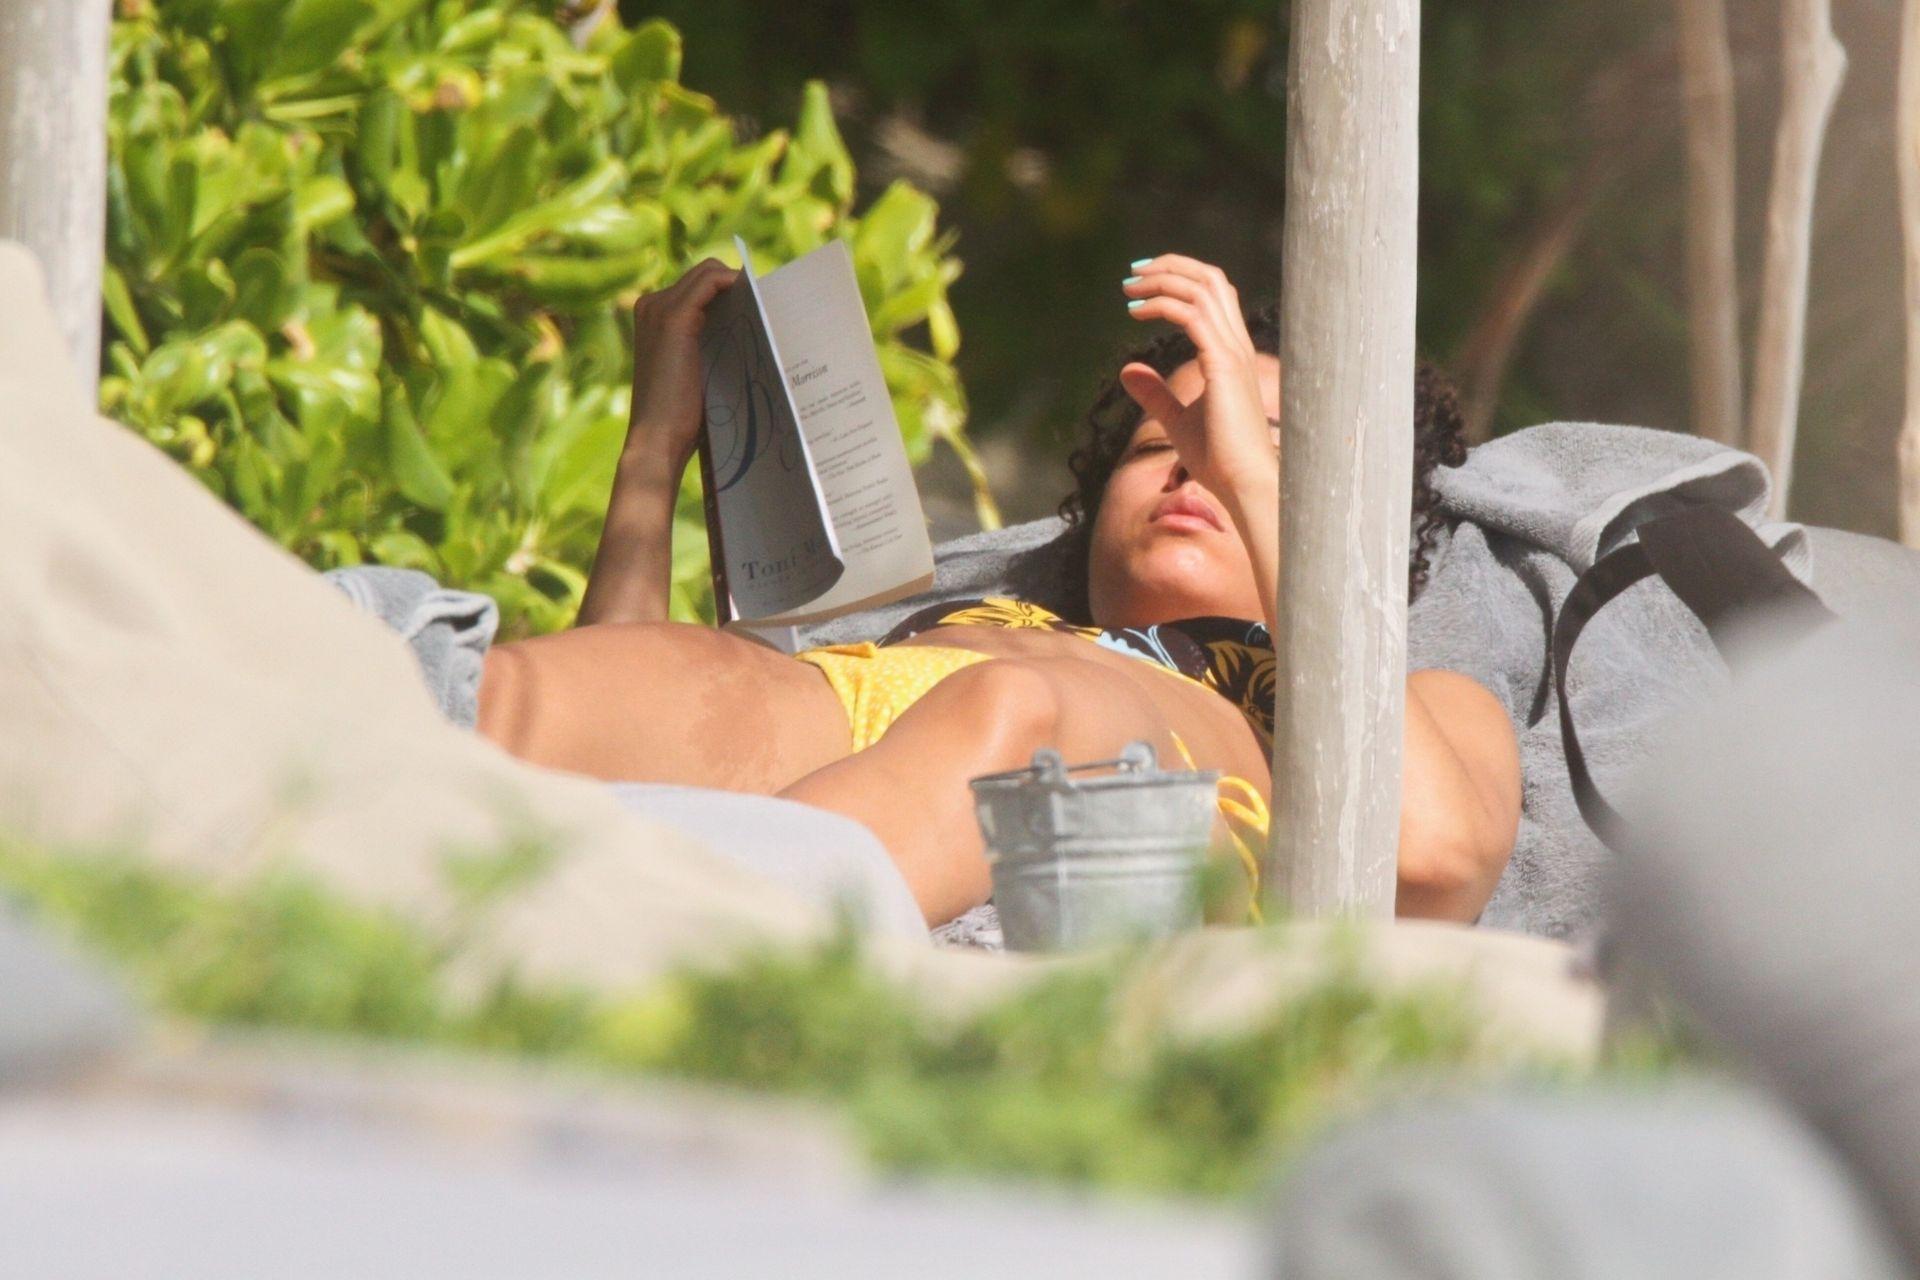 Alisha Wainwright Enjoys A Sun Filled Getaway In Tulum 0087